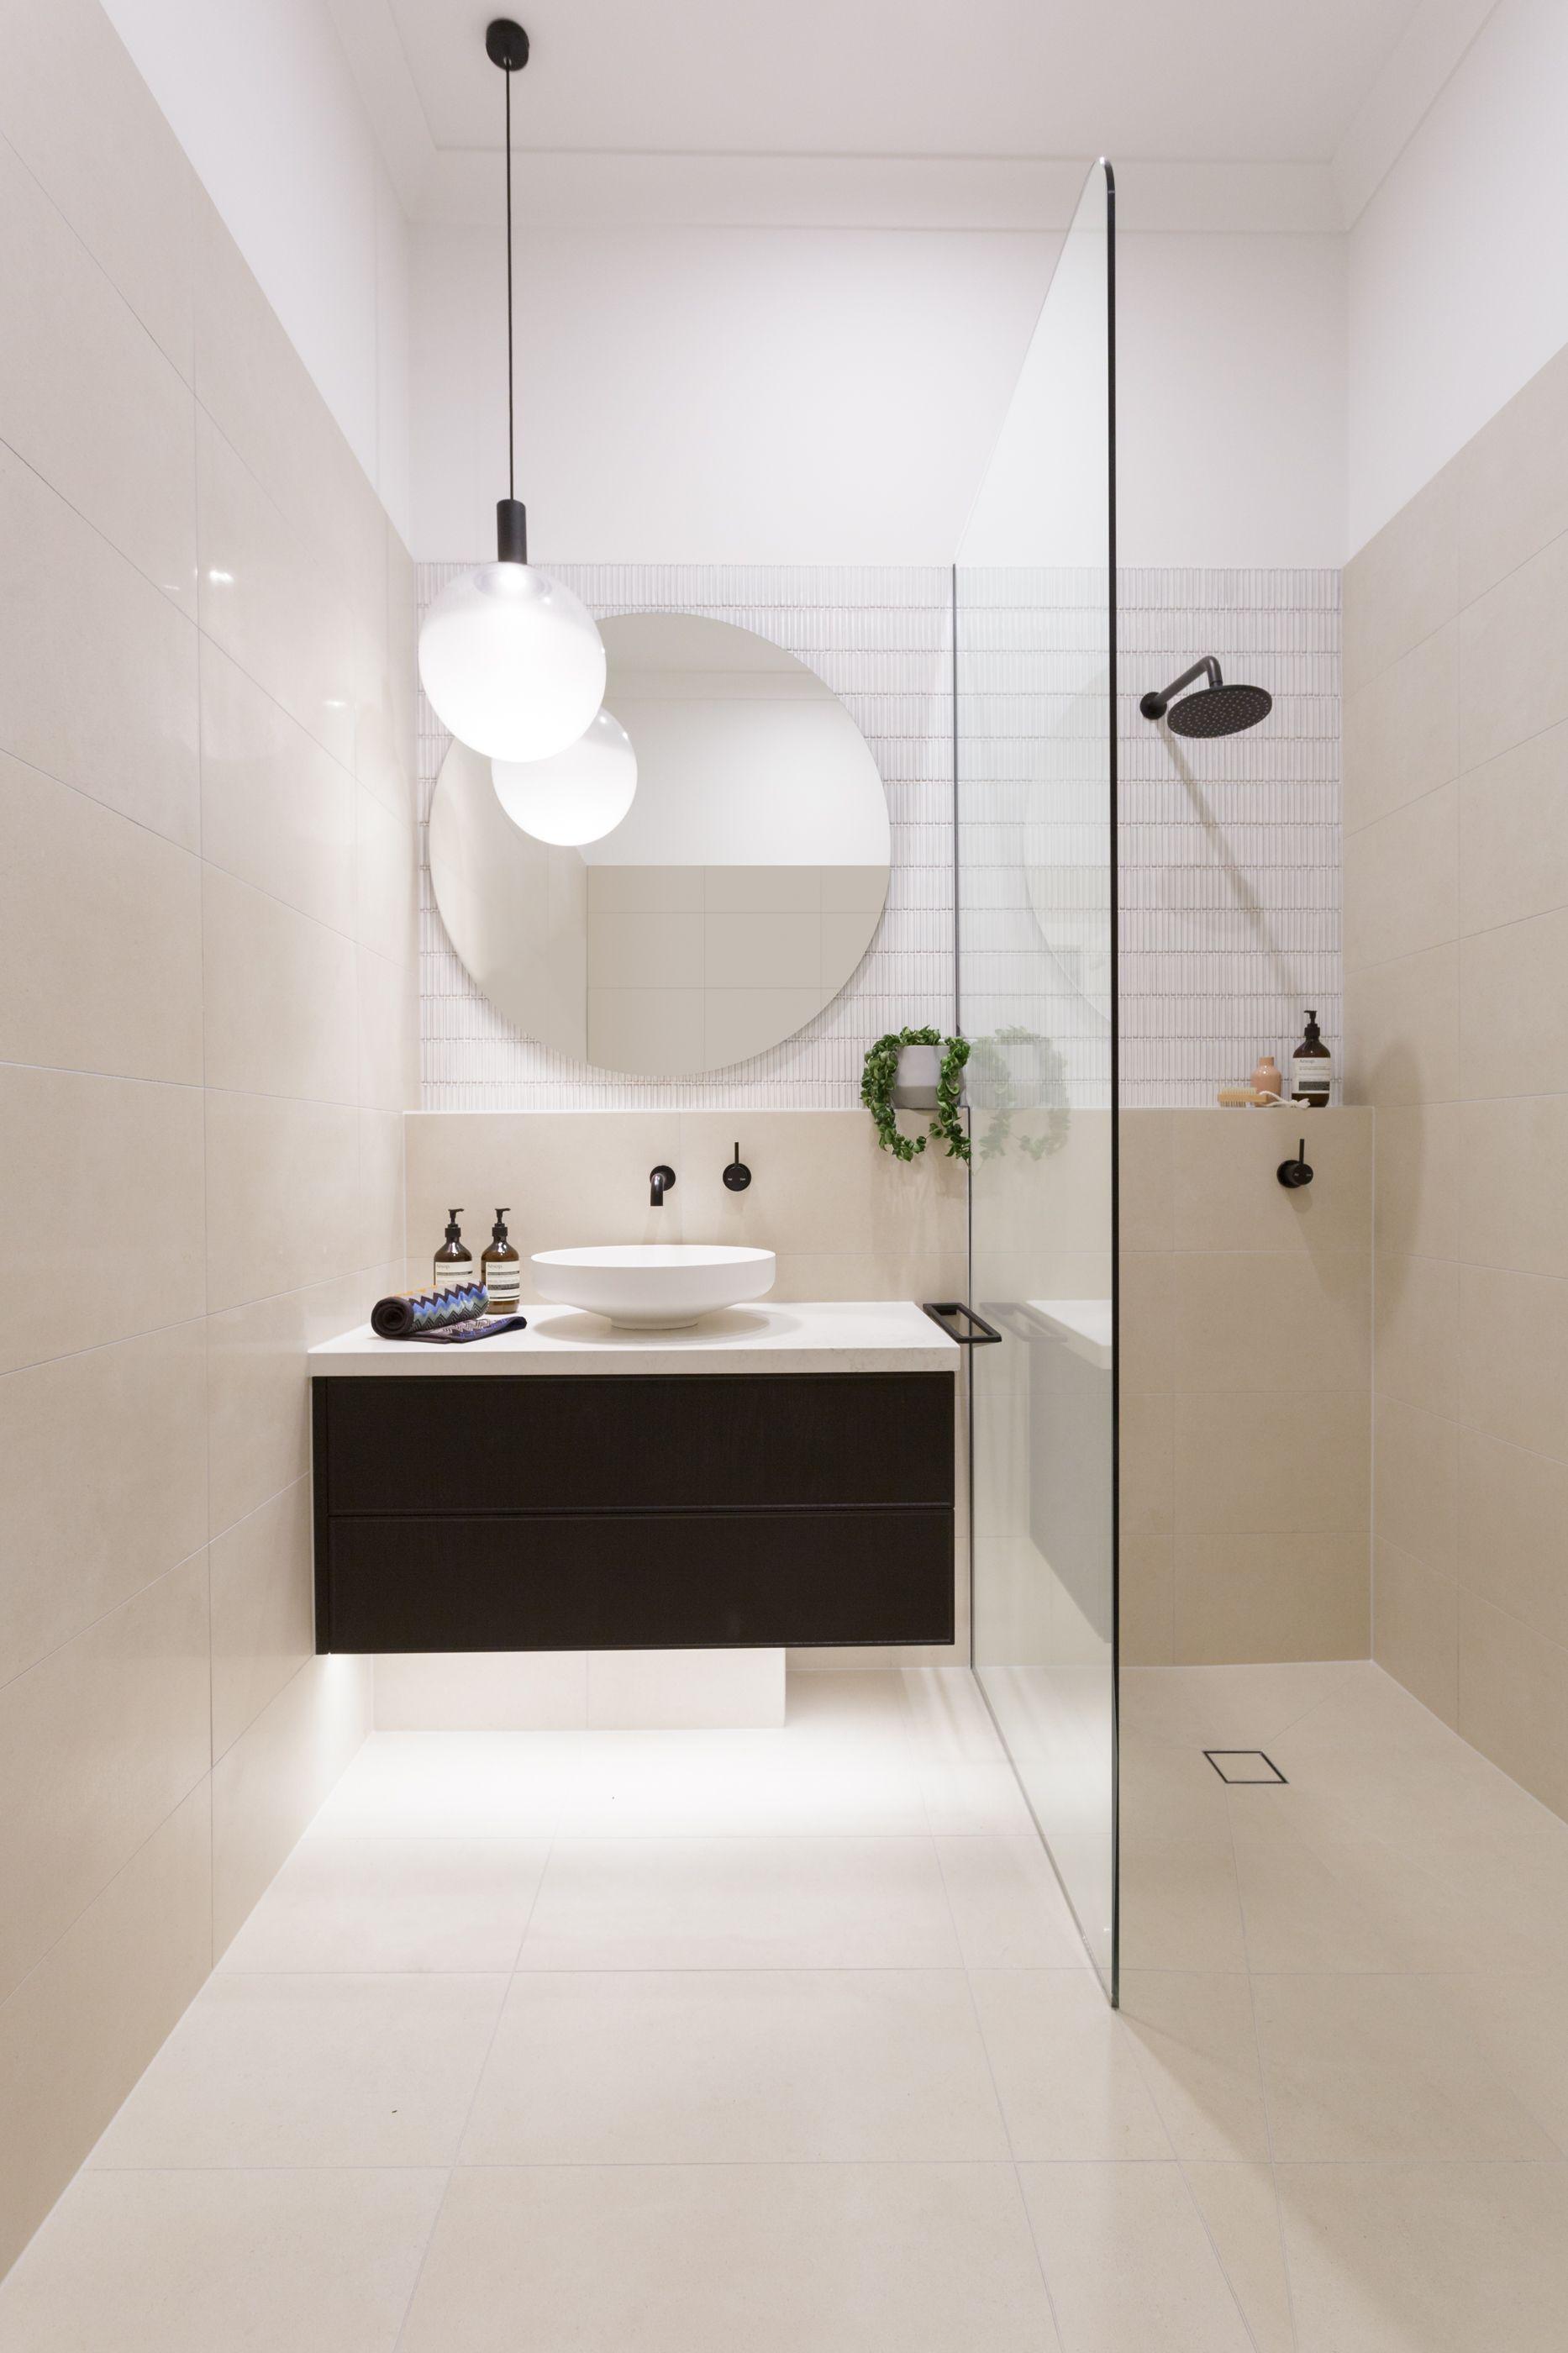 Bathroom Renovations Melbourne Bathroom Decor Bathroom Renovations Melbourne Small Bathroom